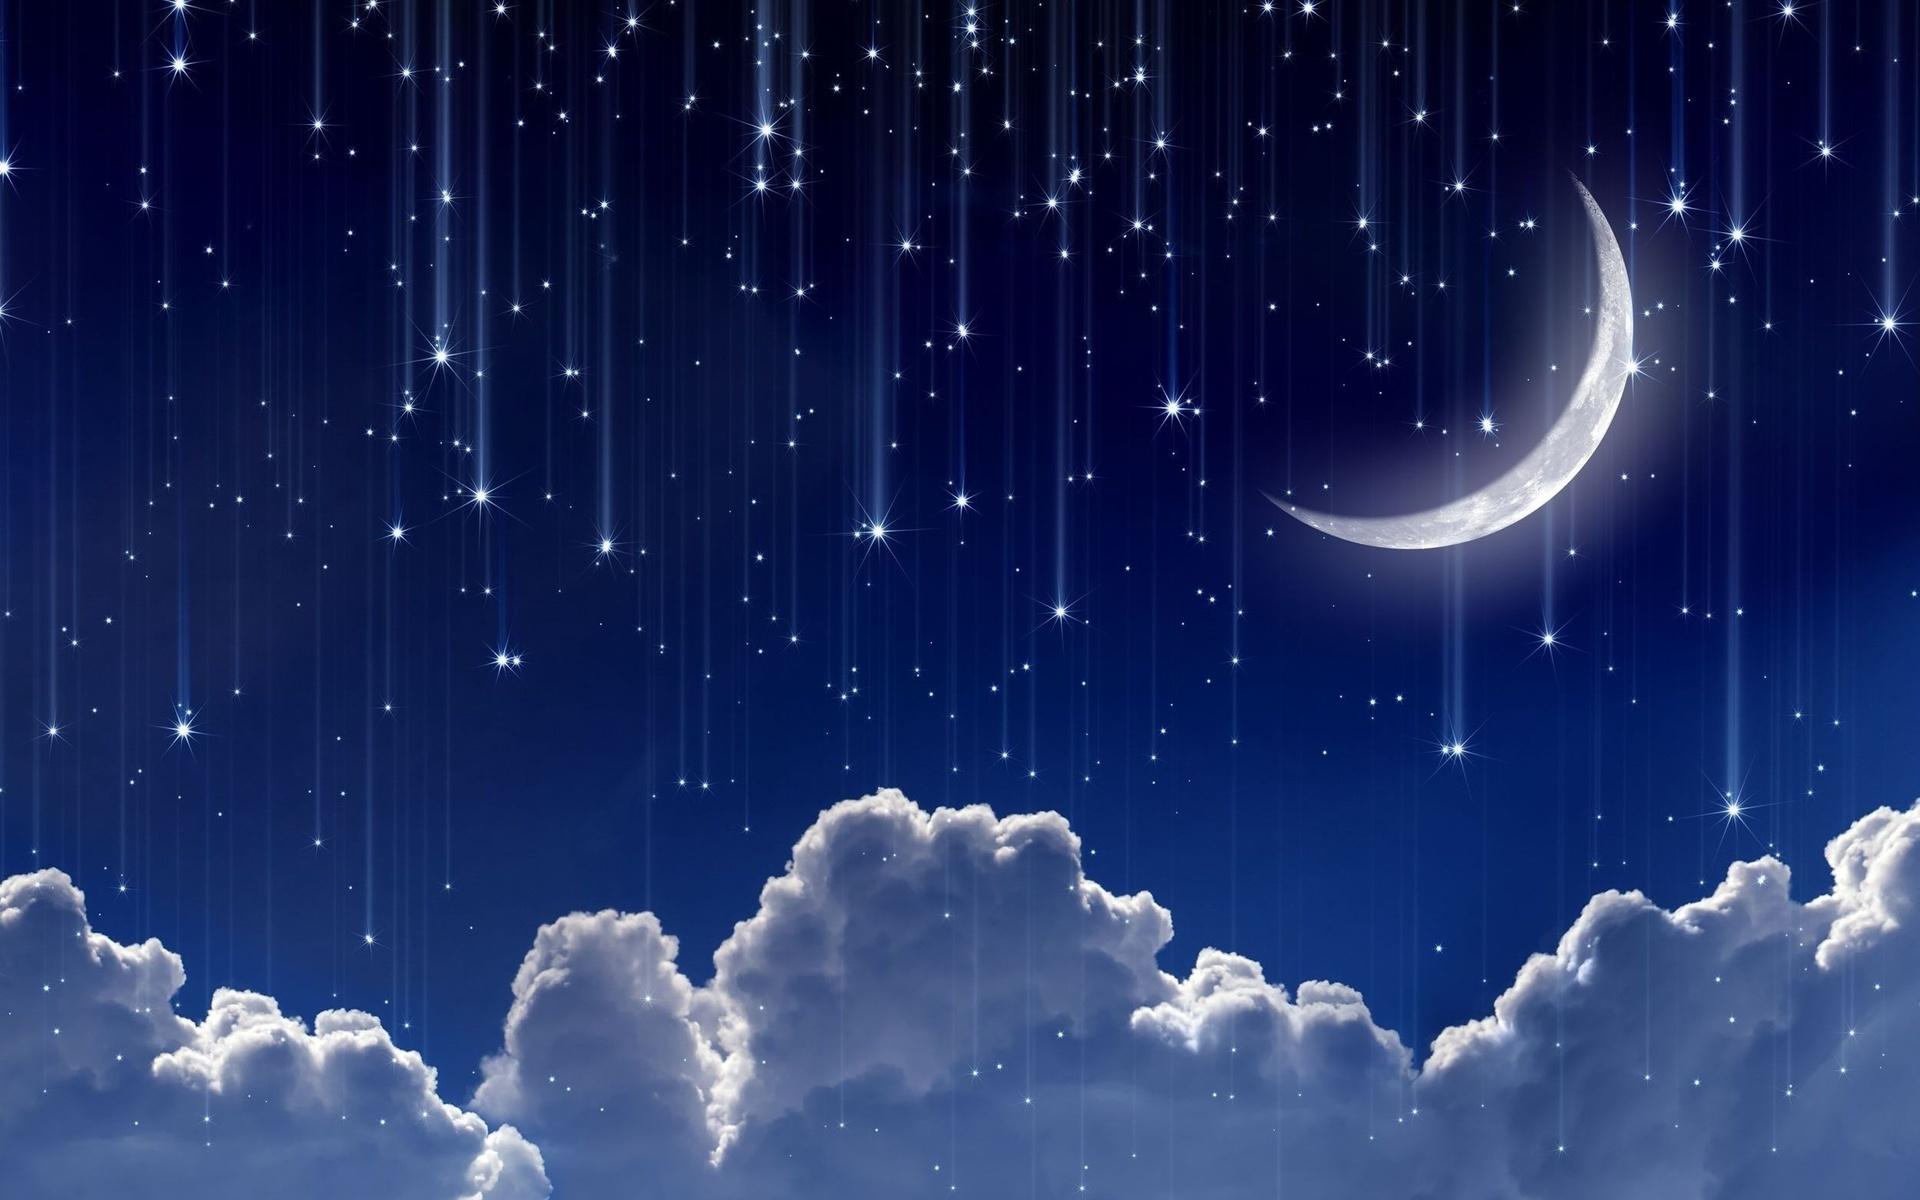 Картинки луна и звезды